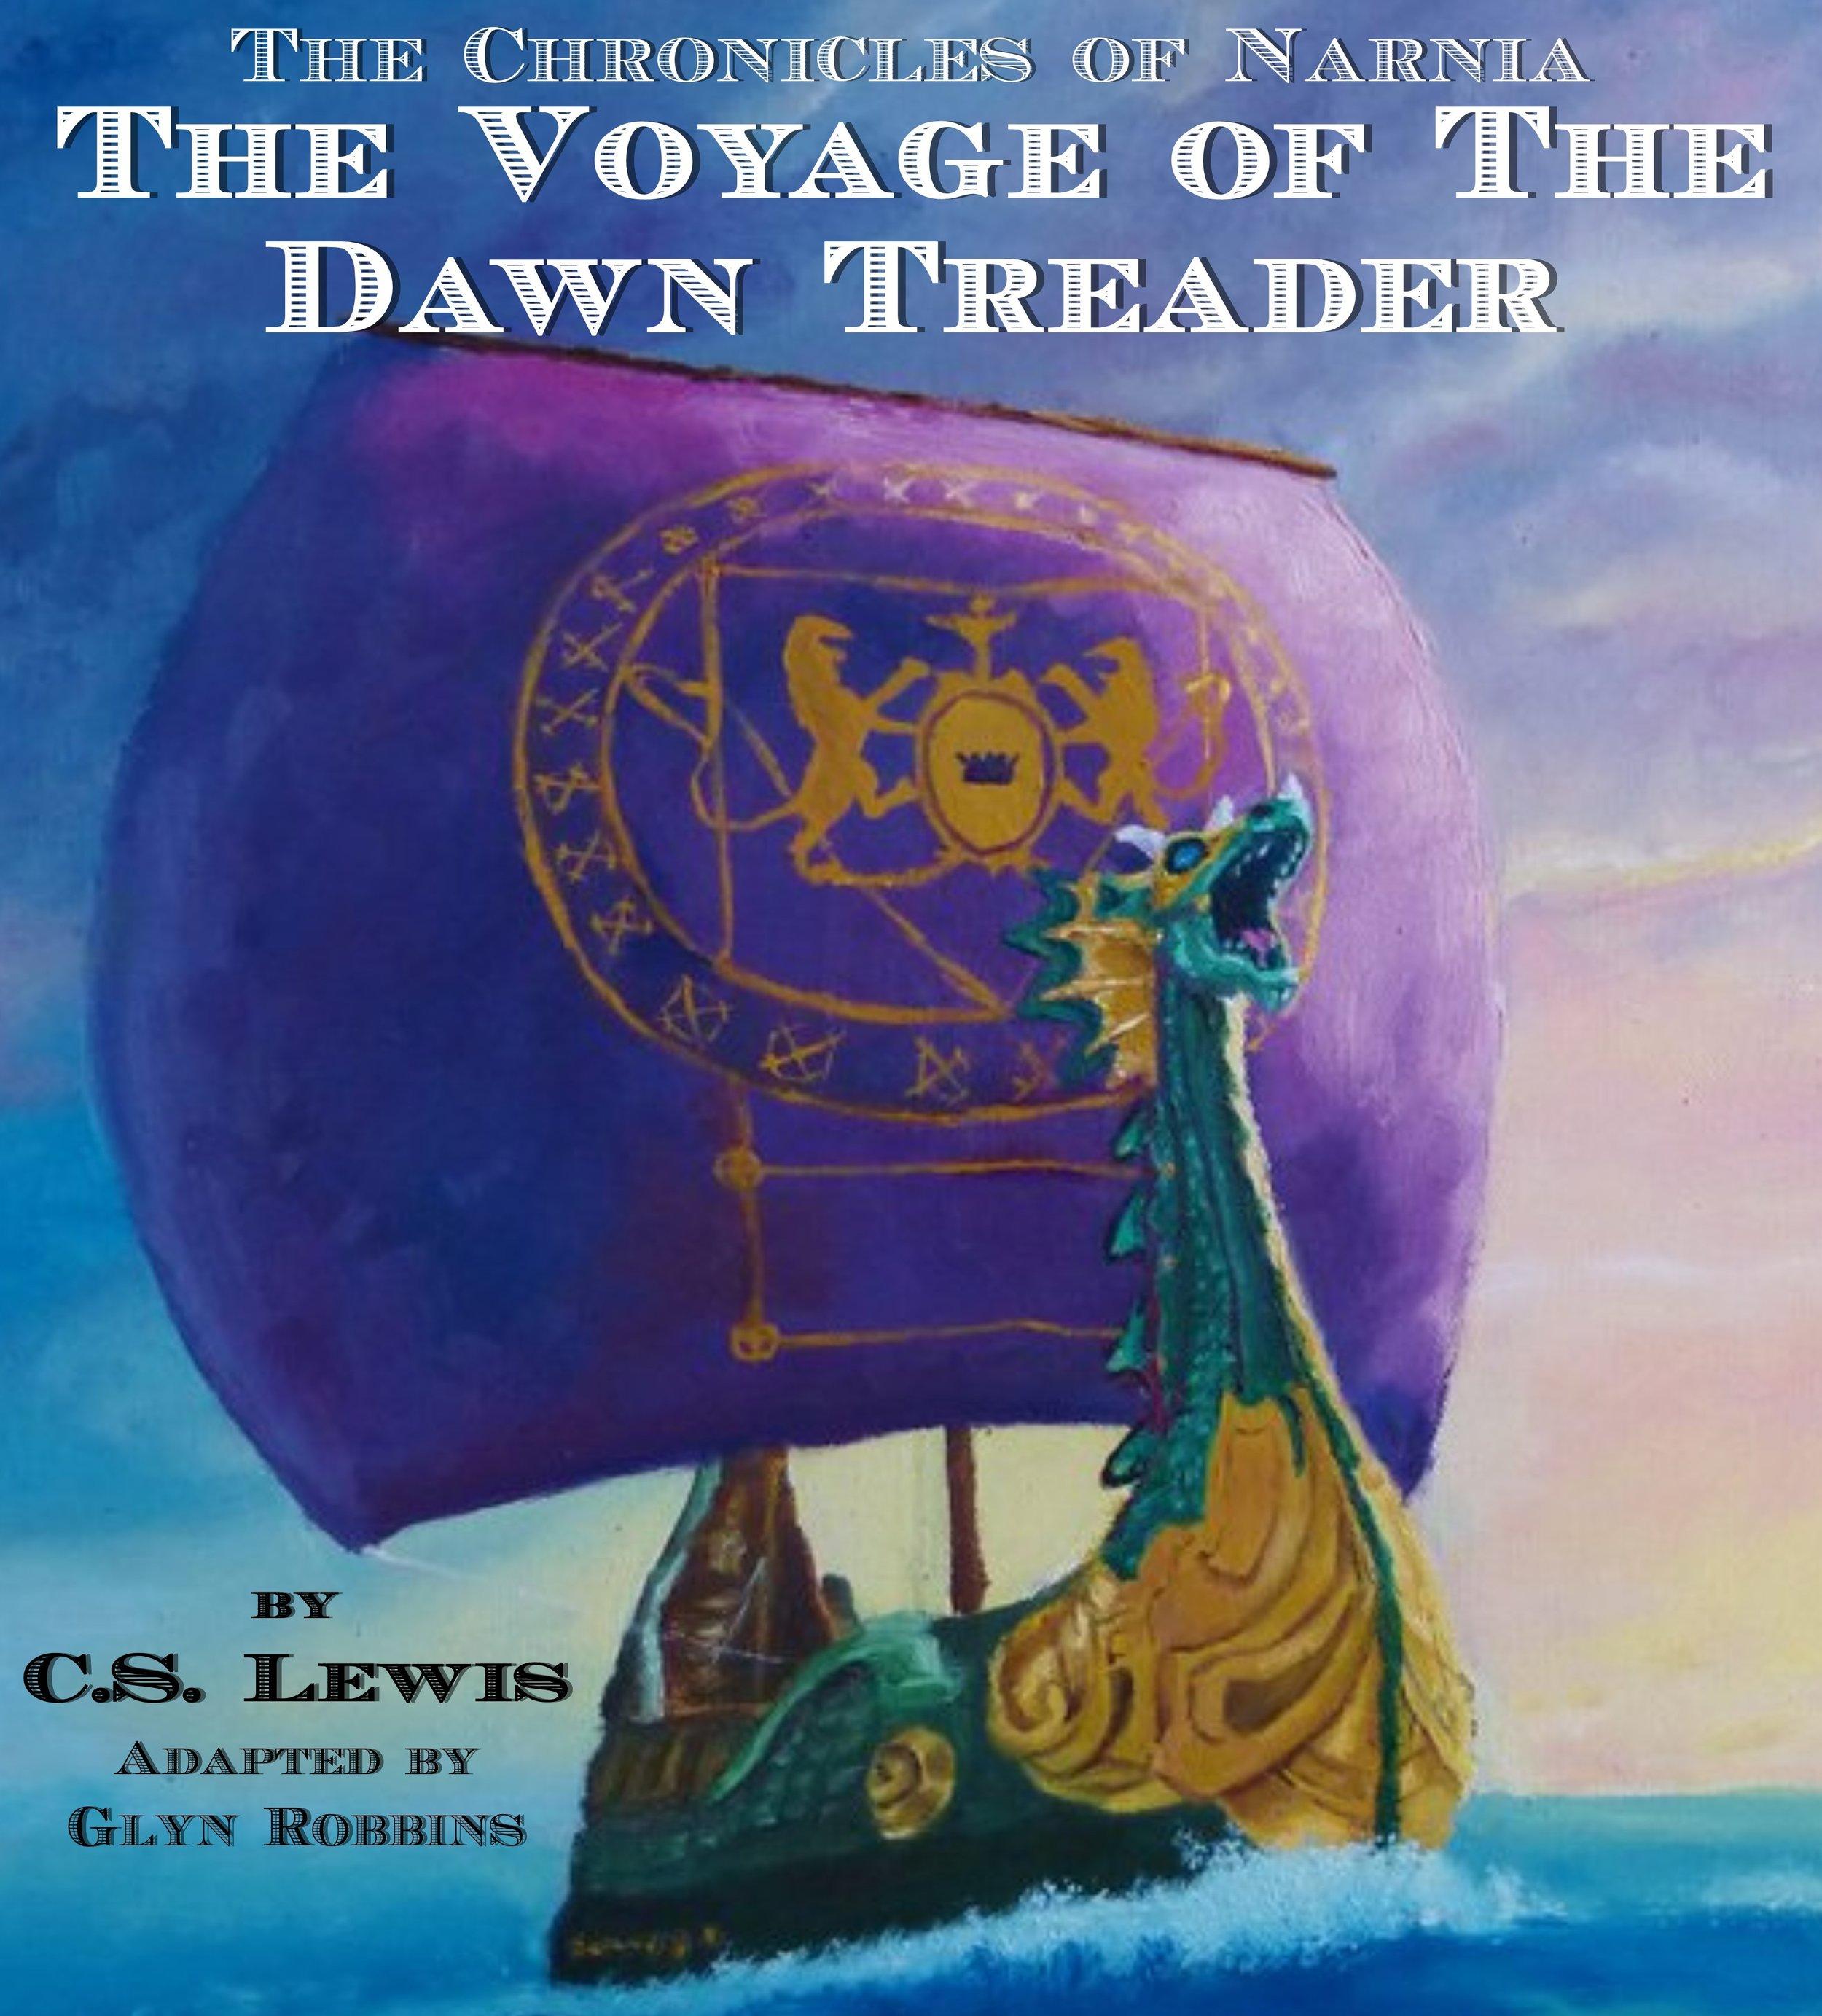 The Voyage of The Dawn Treader web image.jpg